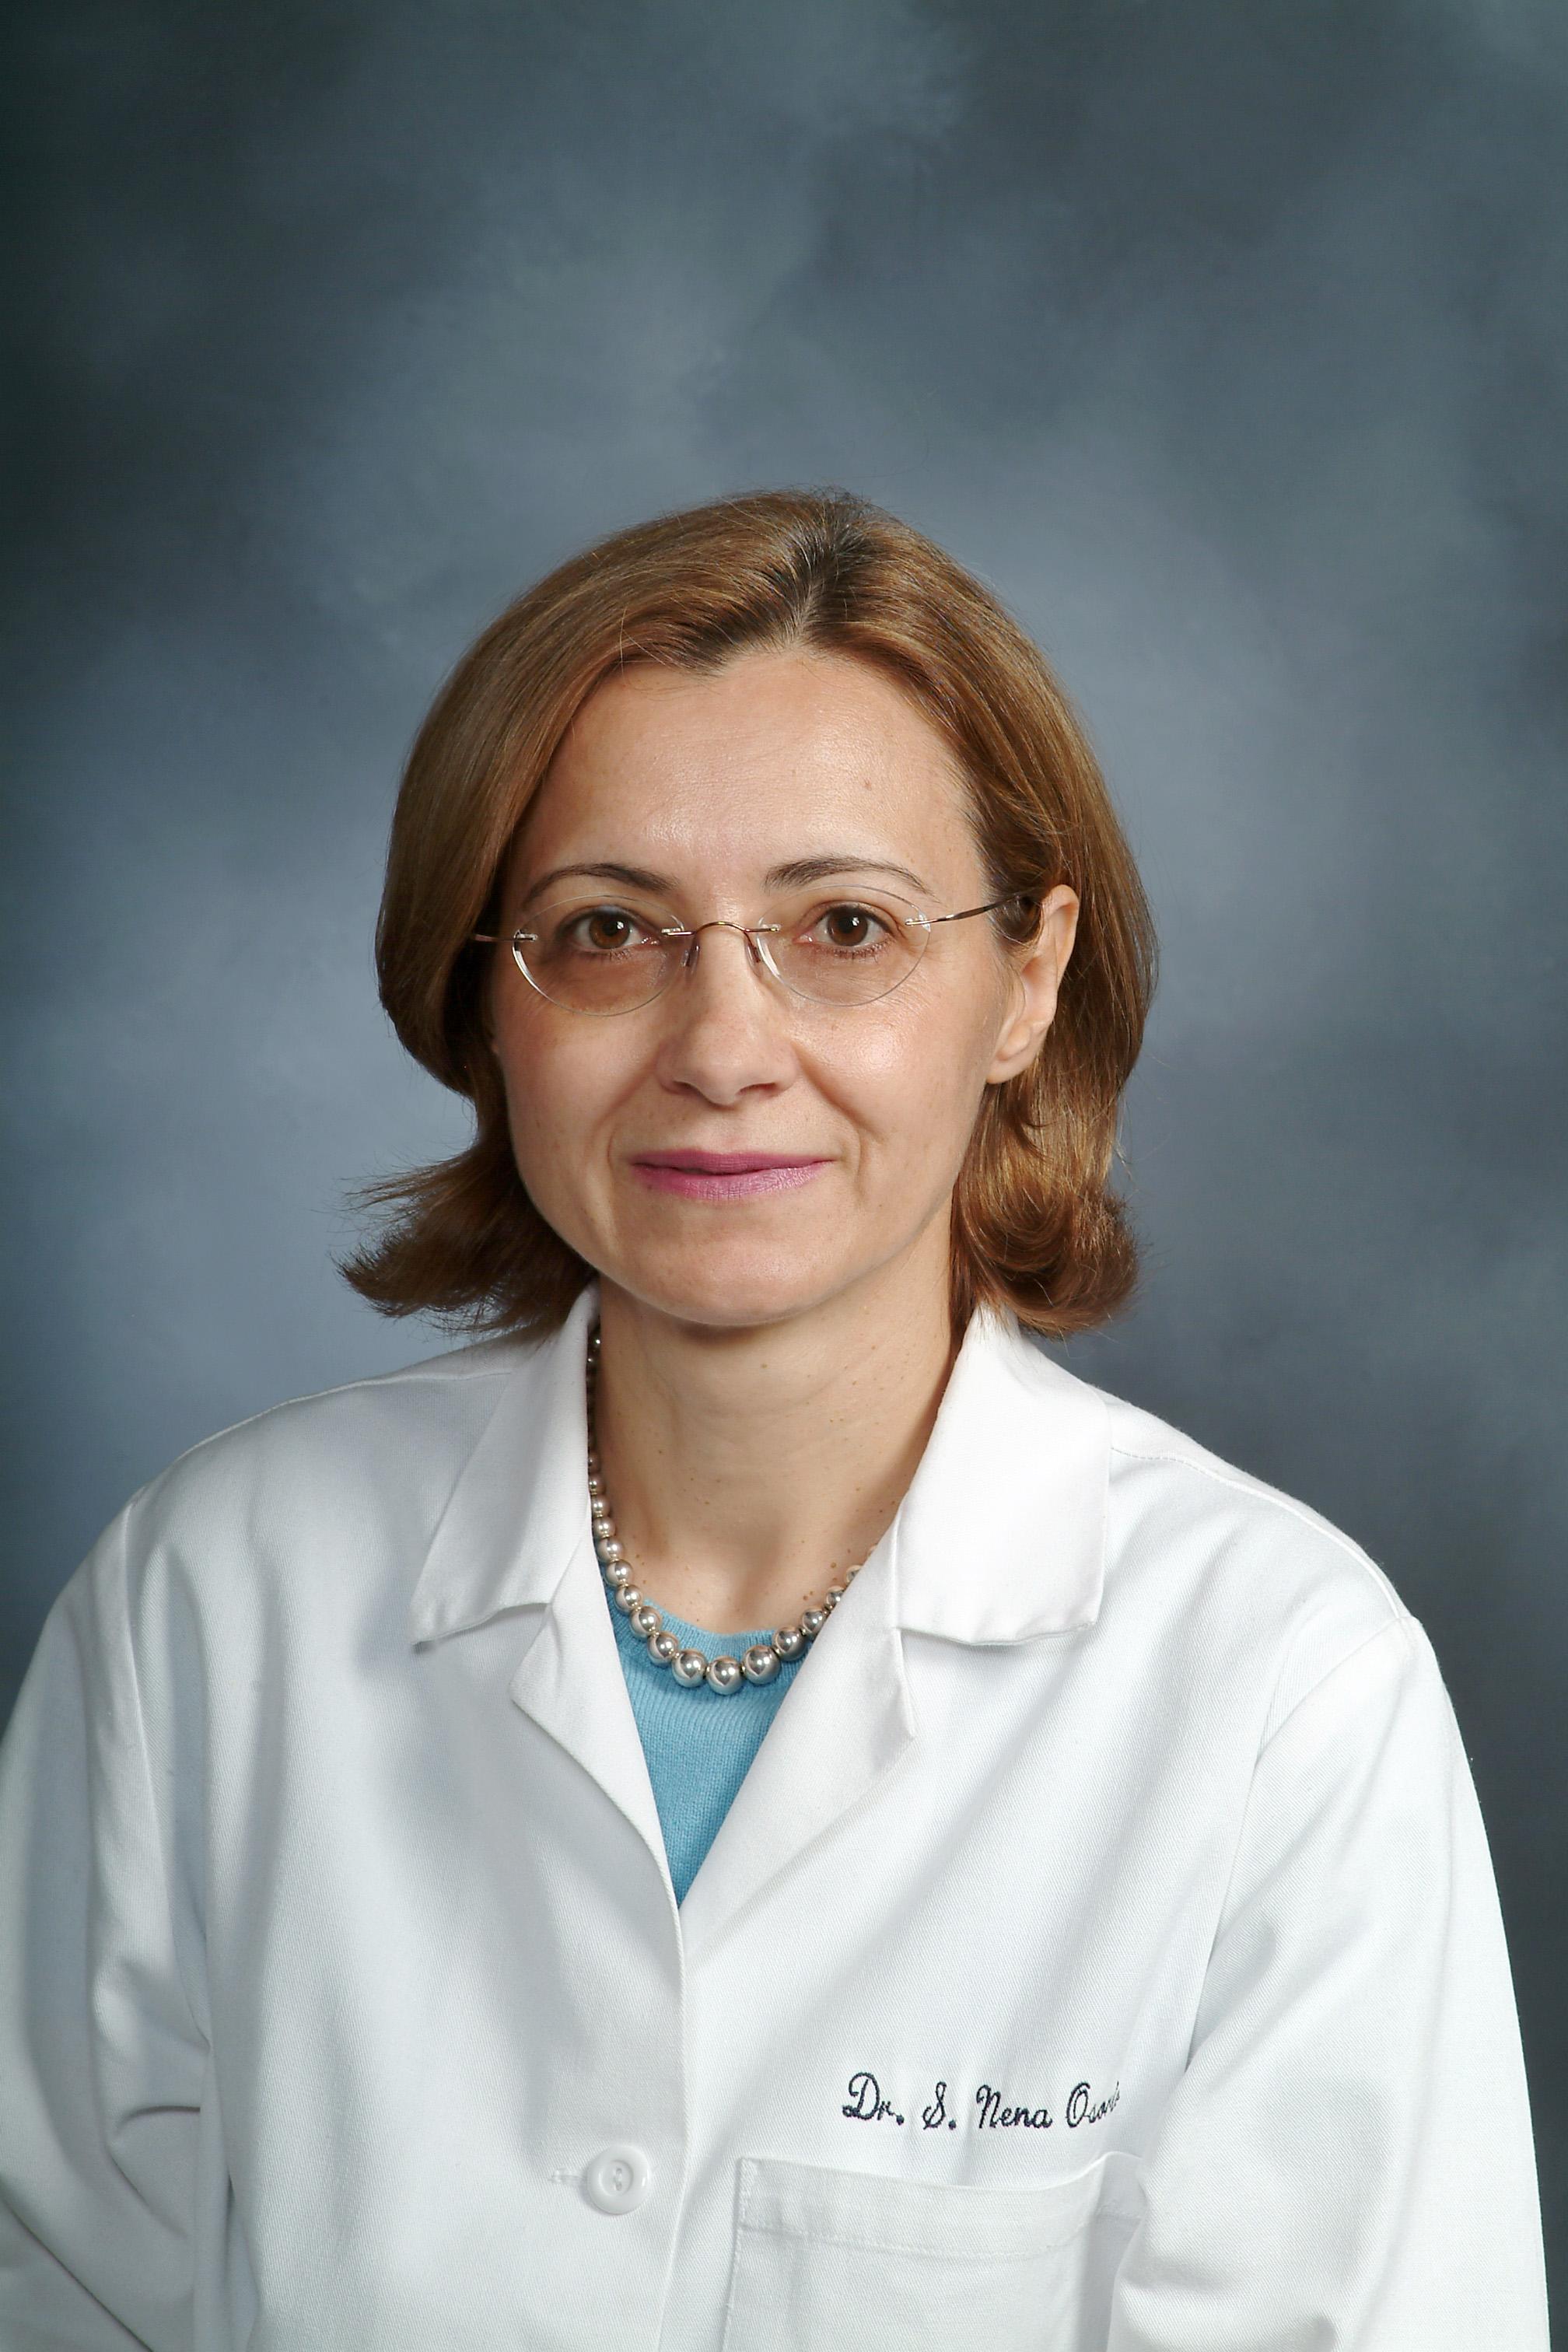 Snezana Nena Osorio, MD, MS